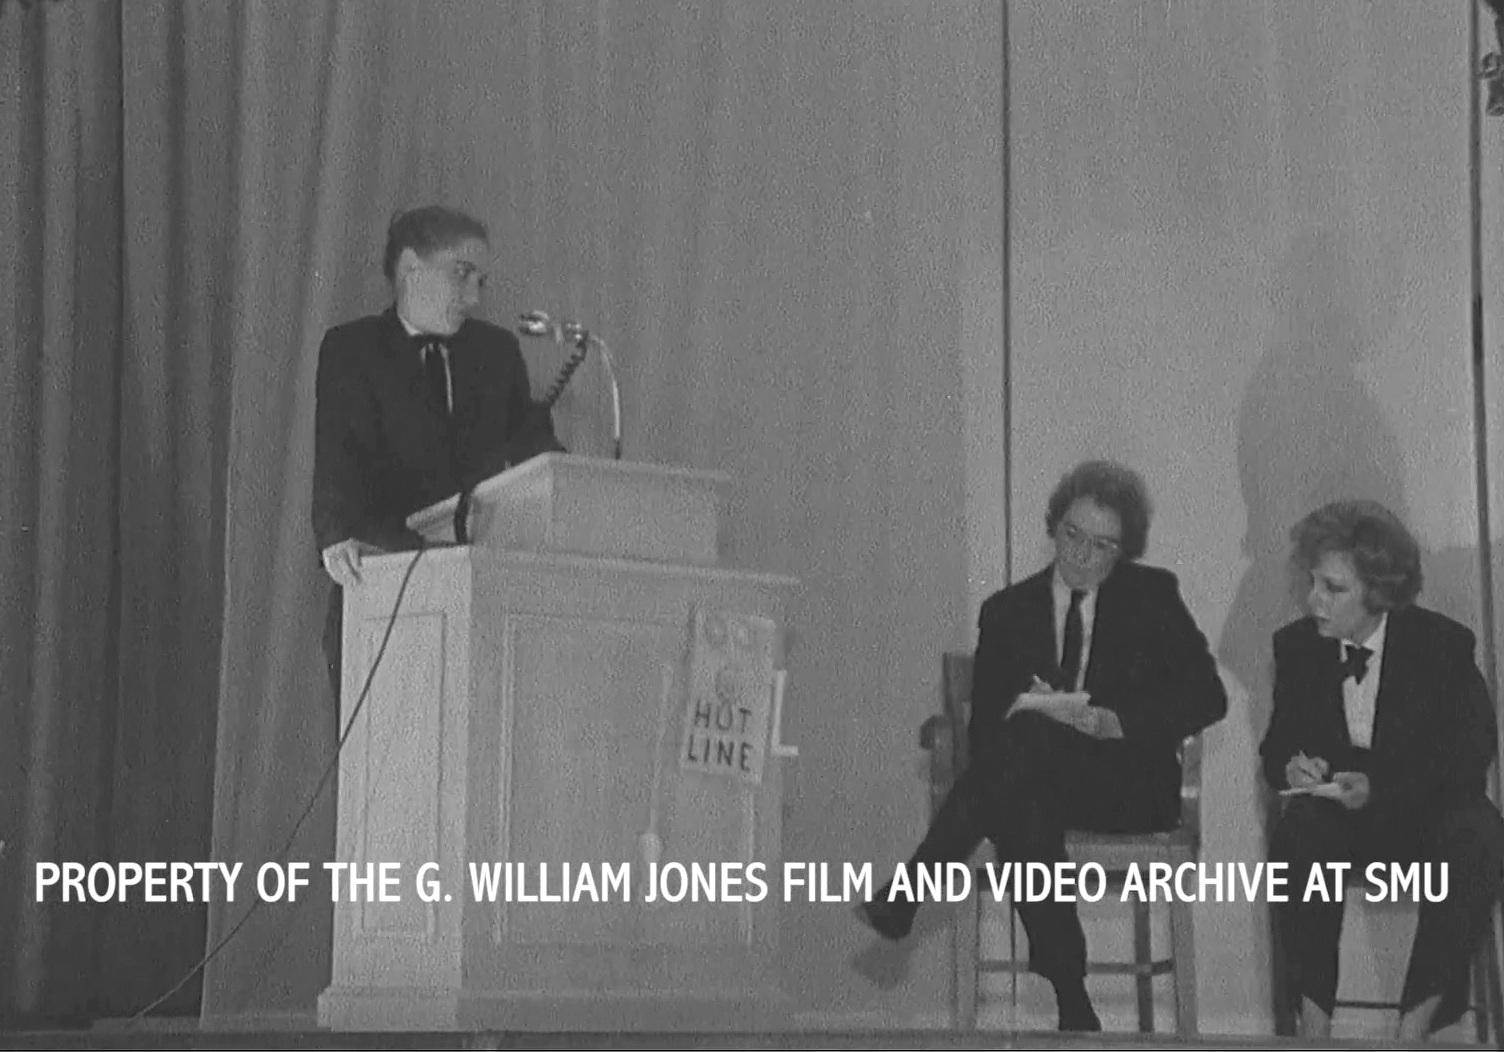 political-paranoia-2_1964_jones-collection_SMU_lbj_ann-richards-5